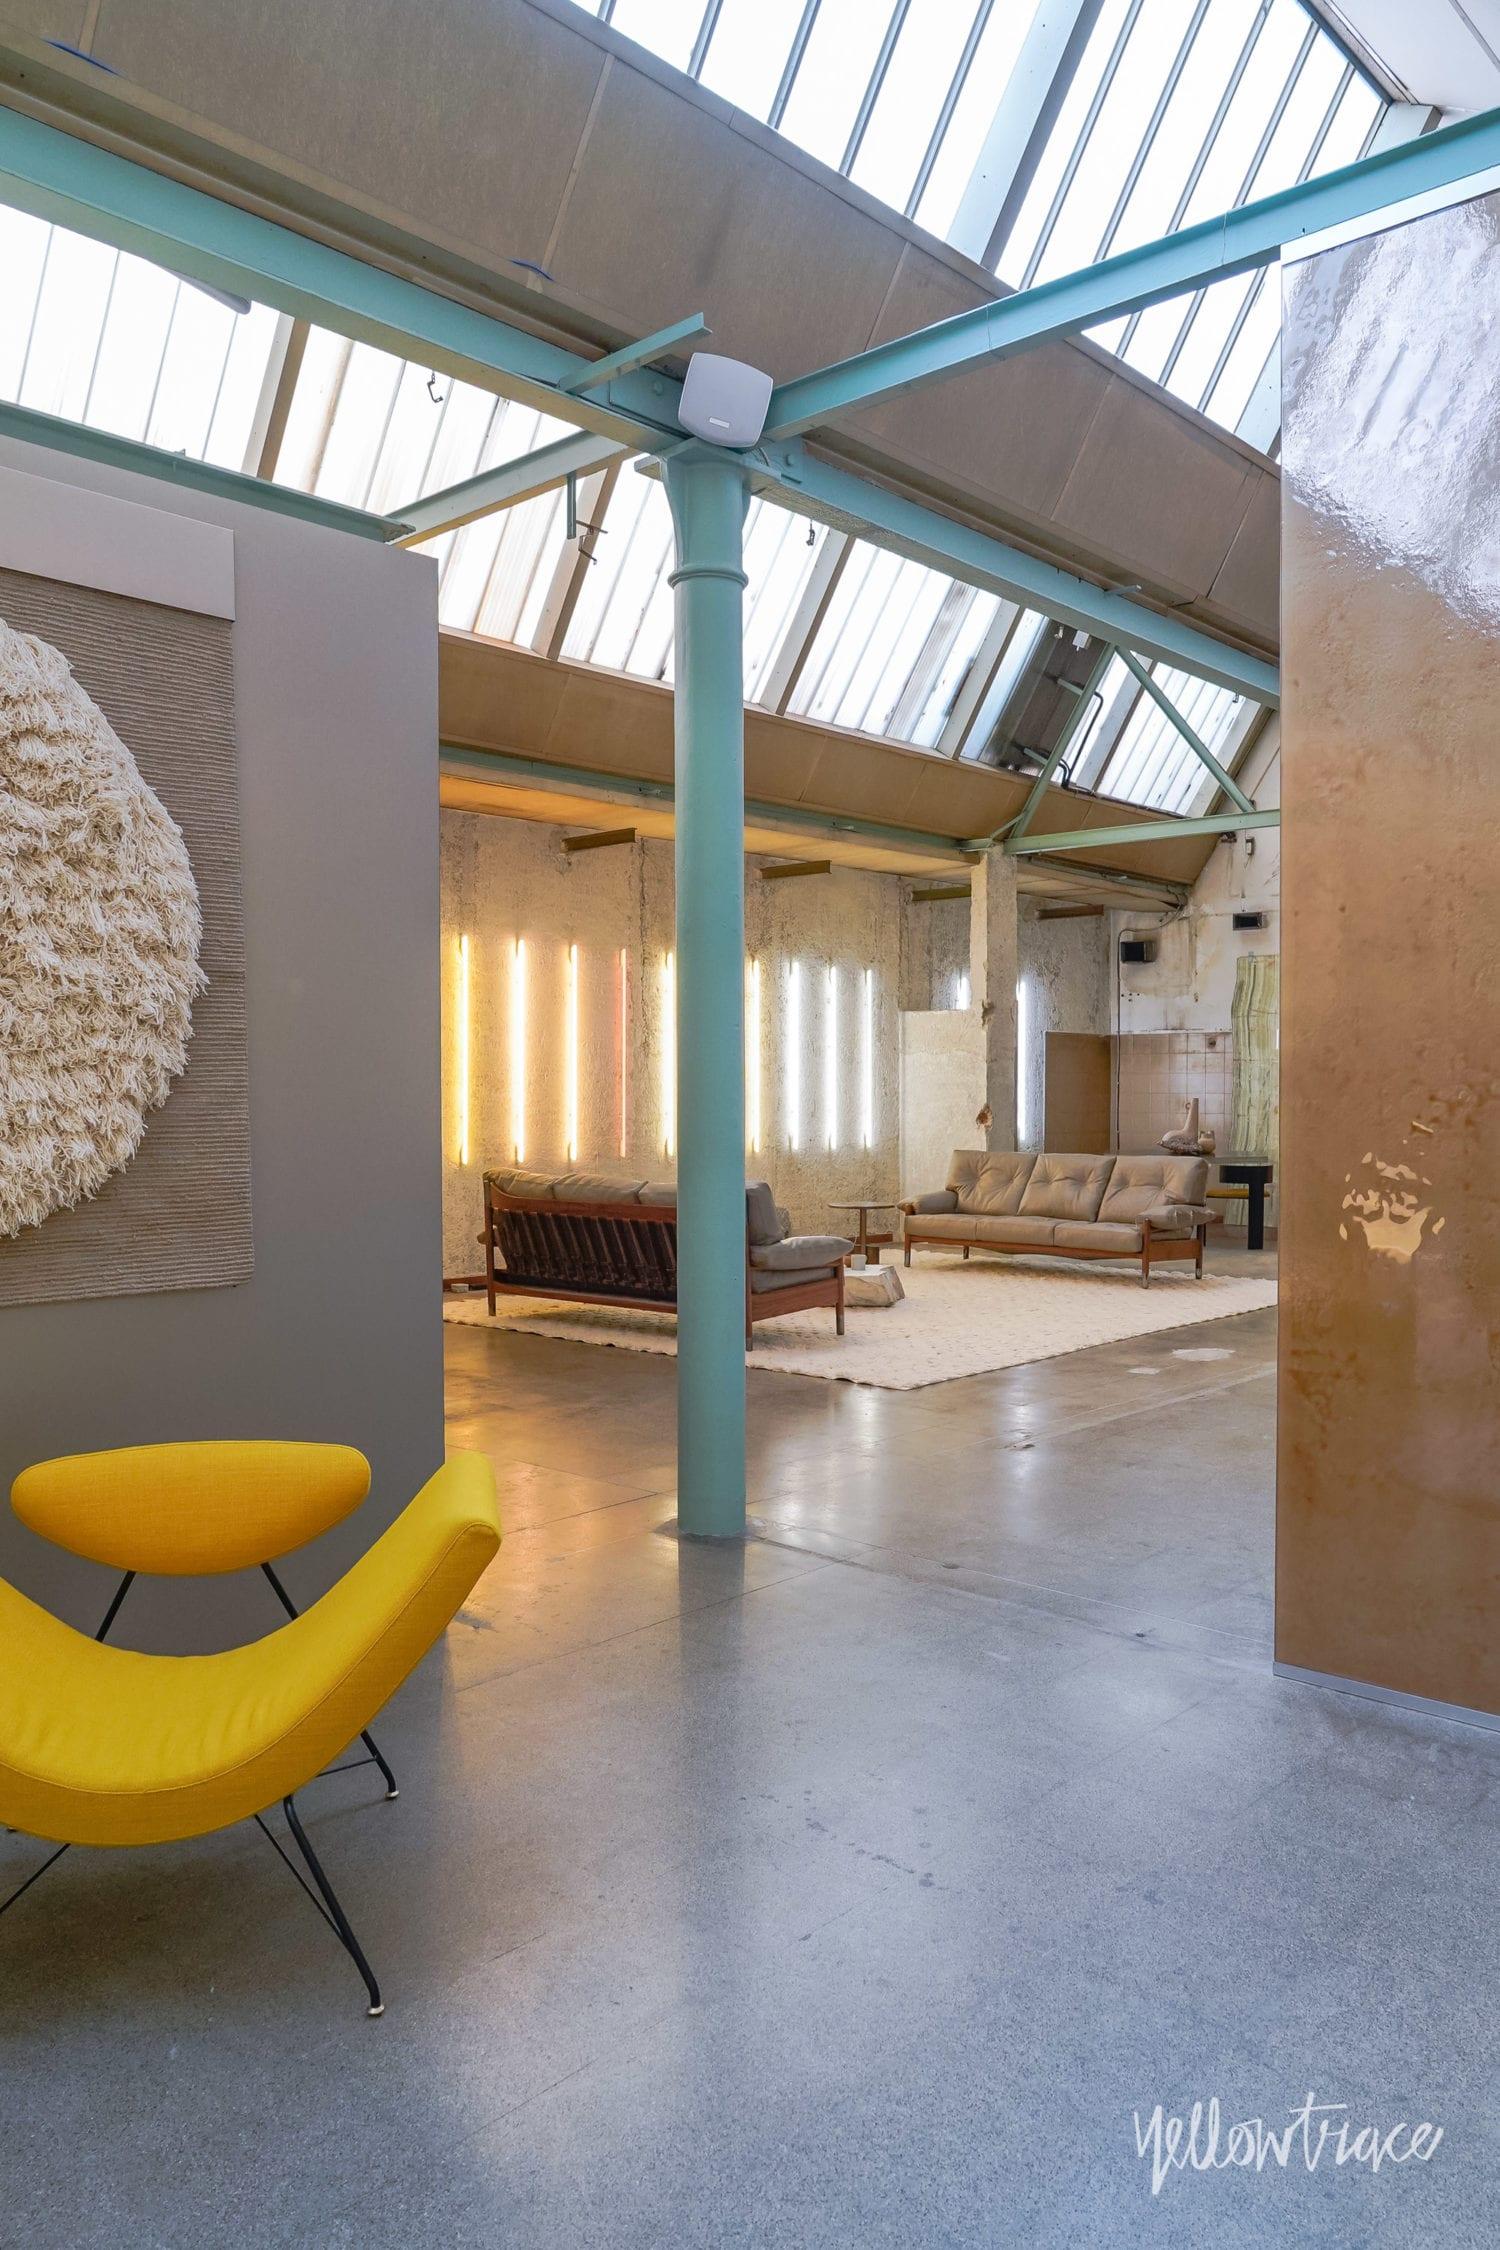 Les Arcanistes Studiopepe At Milan Design Week 2019 Photo Nick Hughes Yellowtrace 40